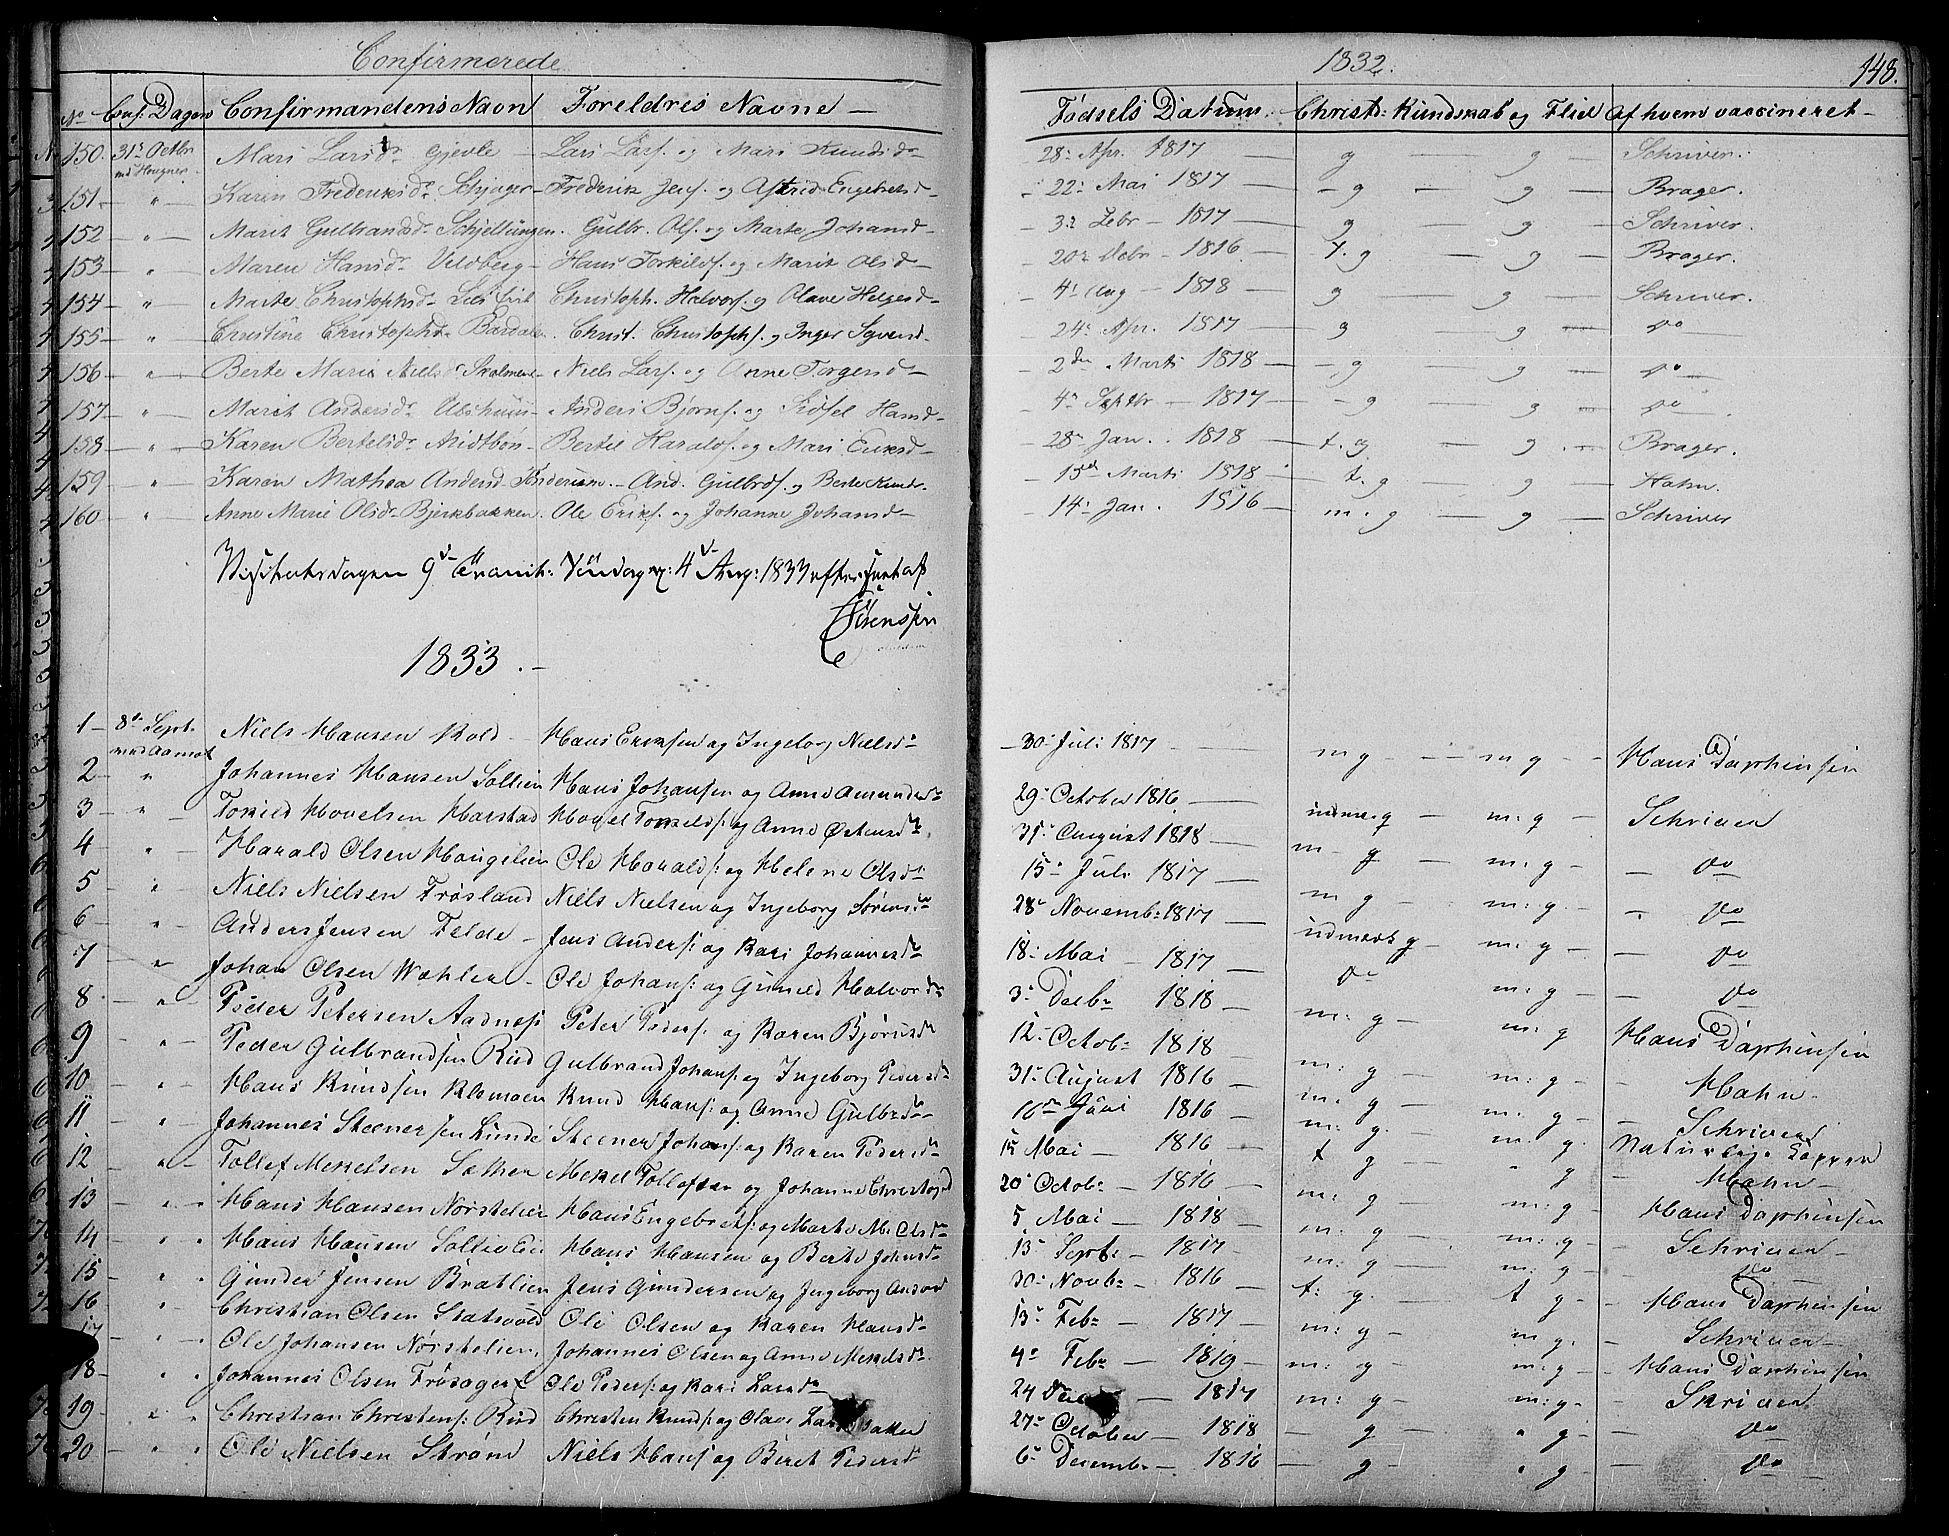 SAH, Land prestekontor, Ministerialbok nr. 8, 1830-1846, s. 148